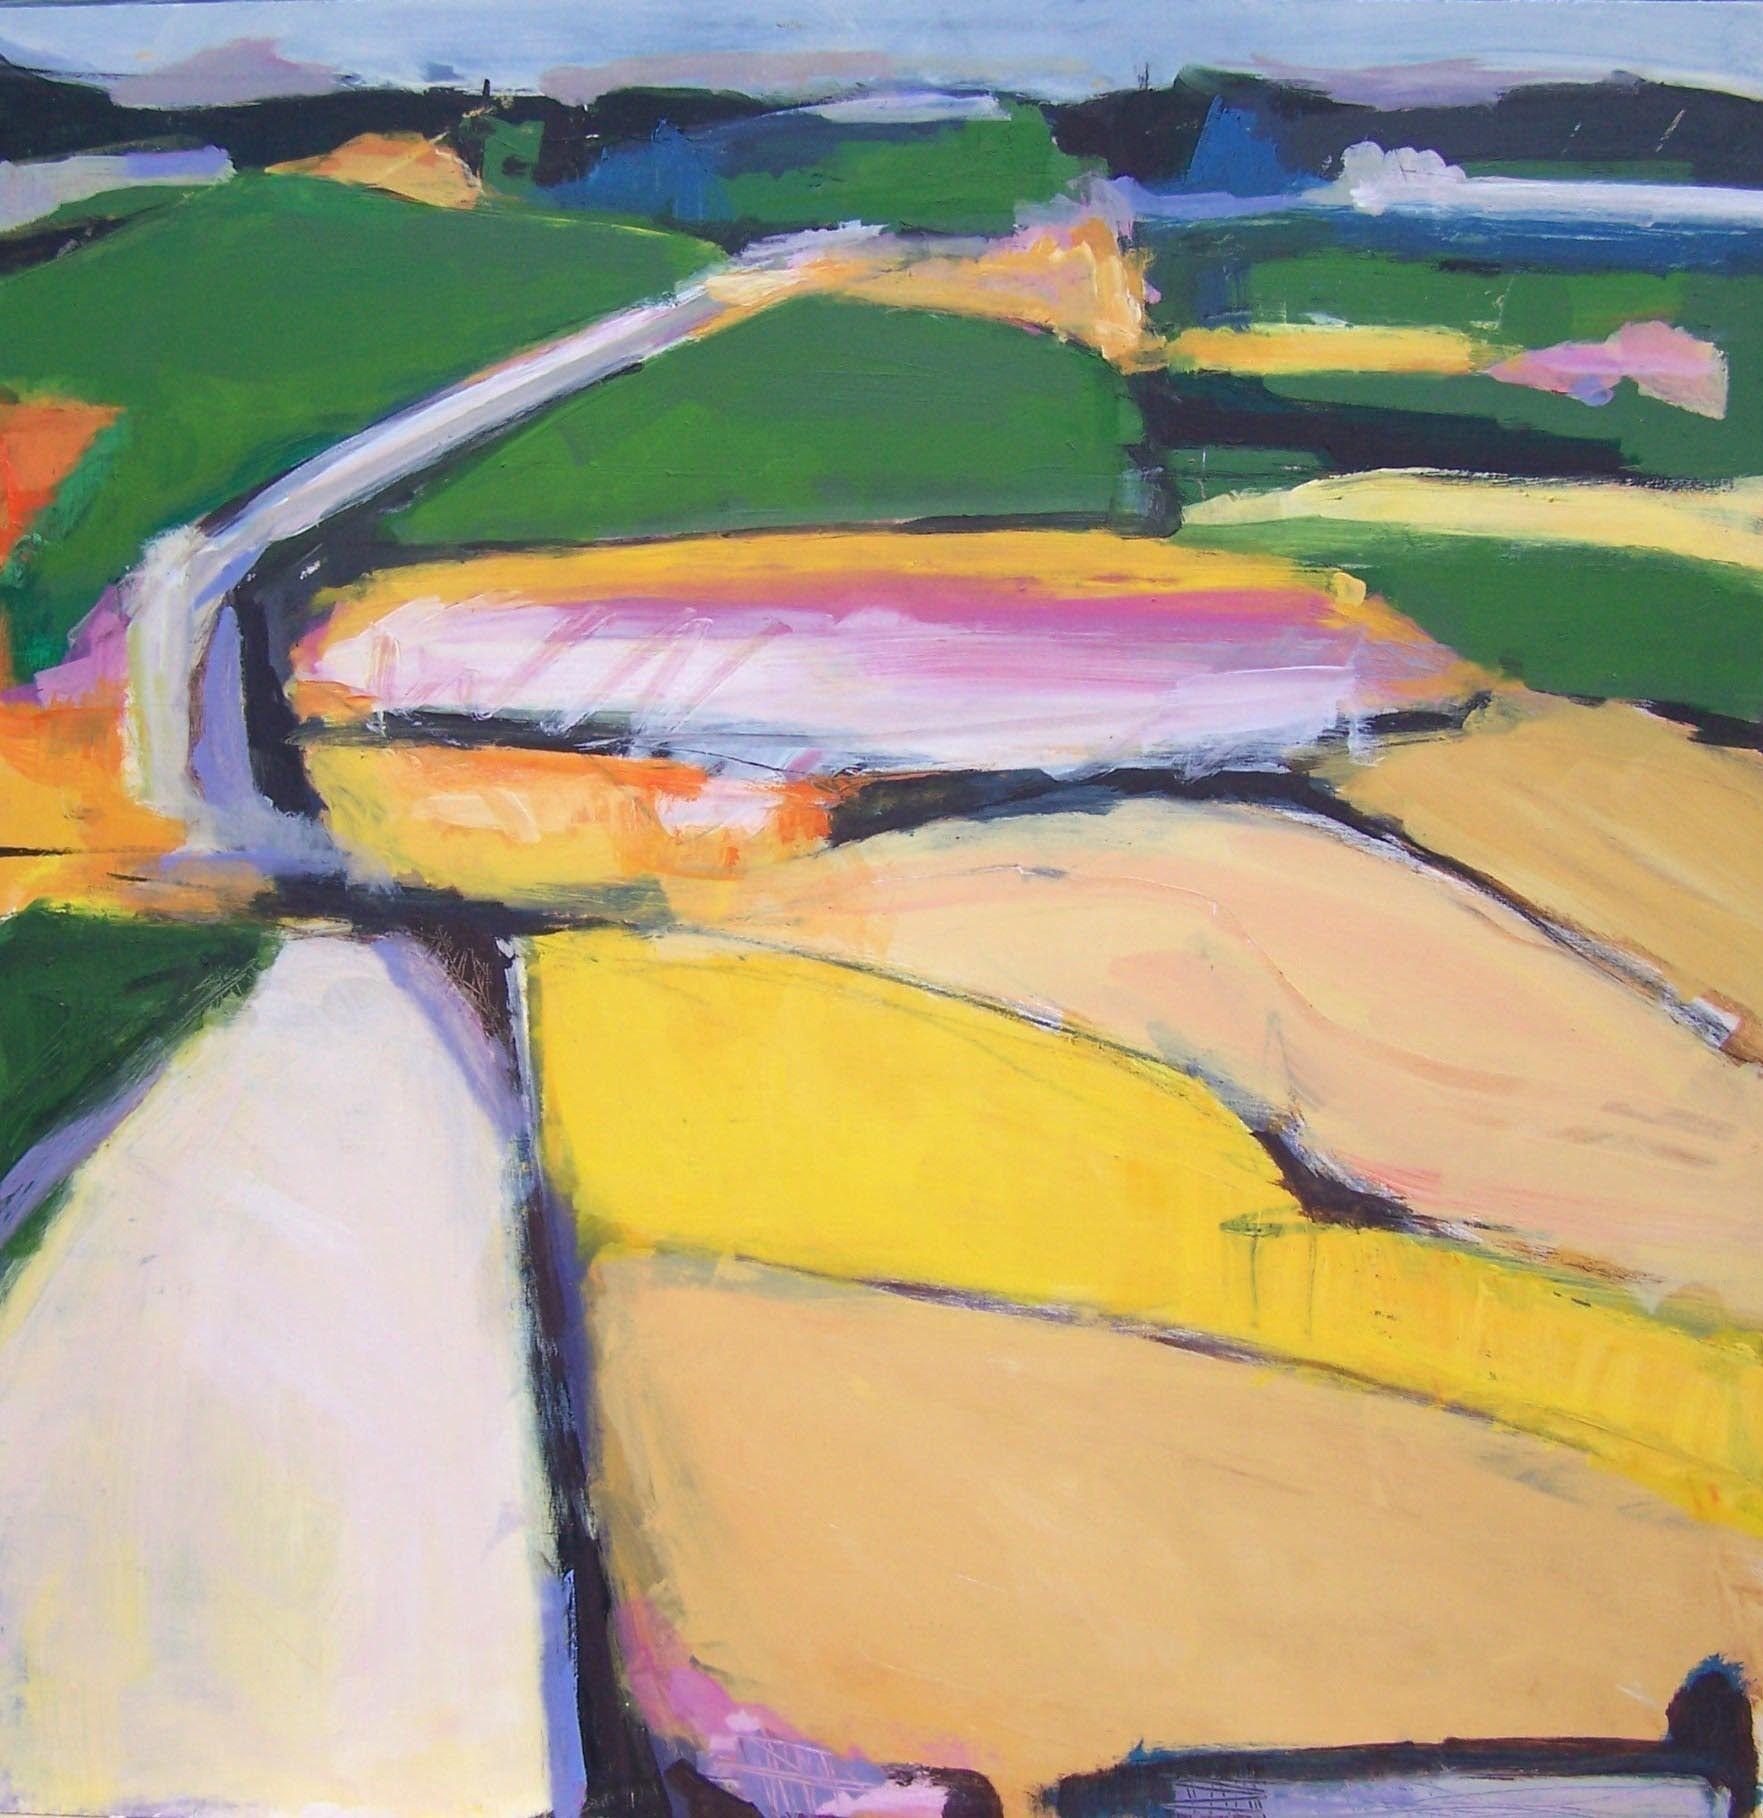 "For Sale: Landscape #4 by Heidi Lanino   $1,000   24""w 24""h   Original Art   https://www.vangoart.co/heidi-hlb-studios/landscape-4-9a810c72-52ba-4a75-84df-501536fa57bd"